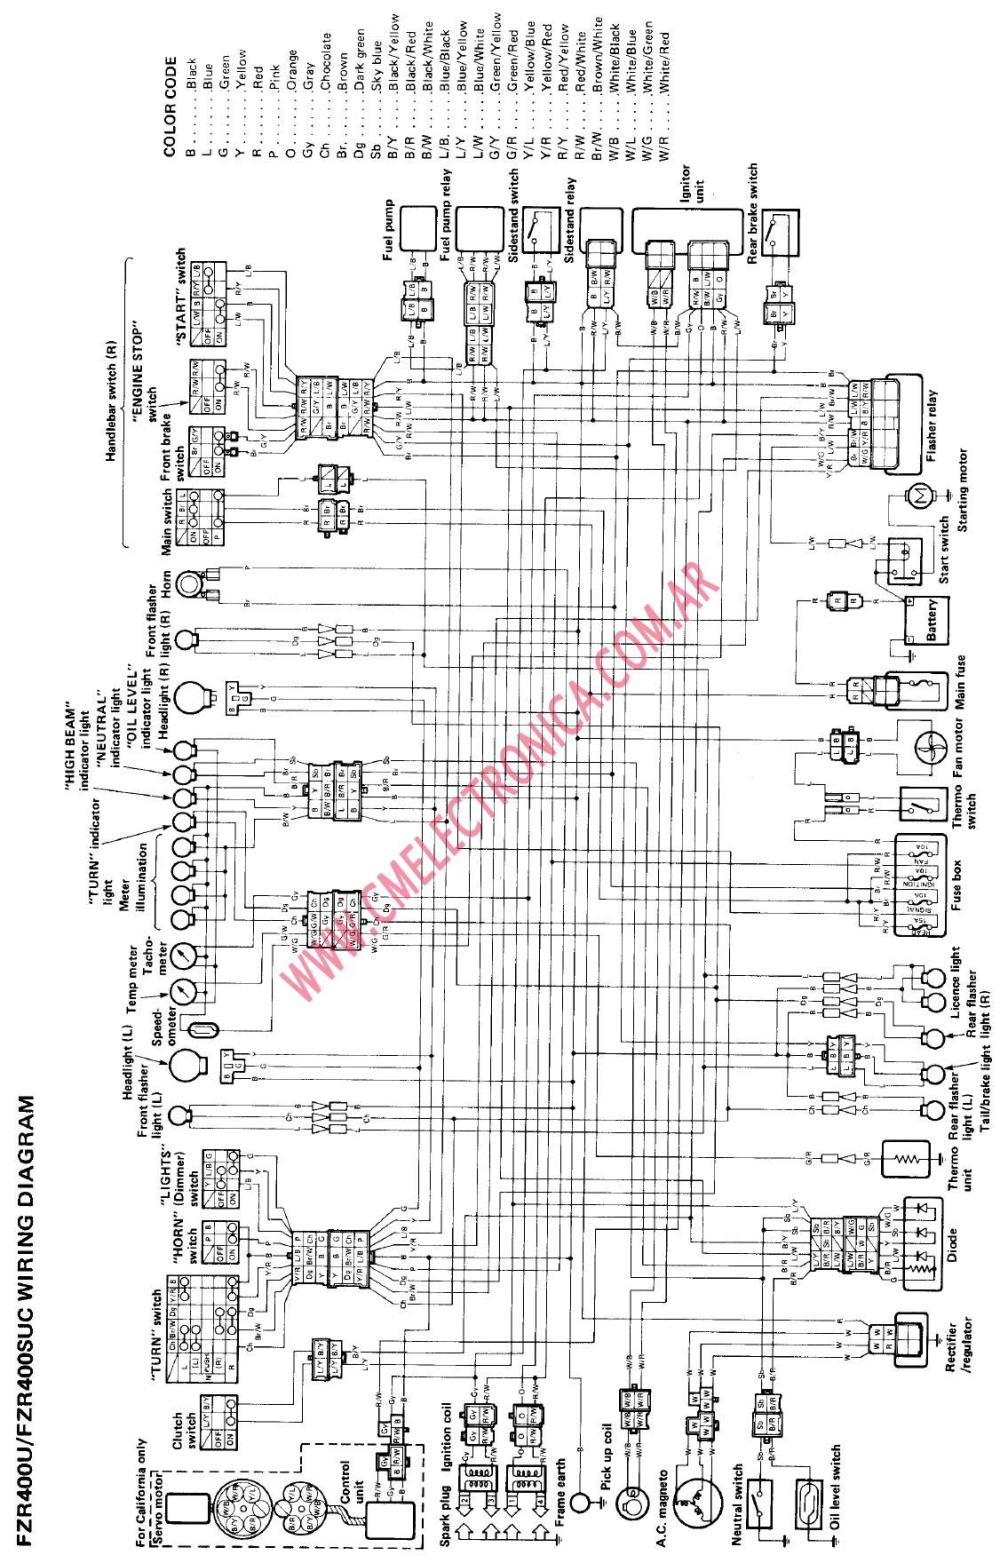 medium resolution of 96 cherokee wiring diagram 96 free engine image for user